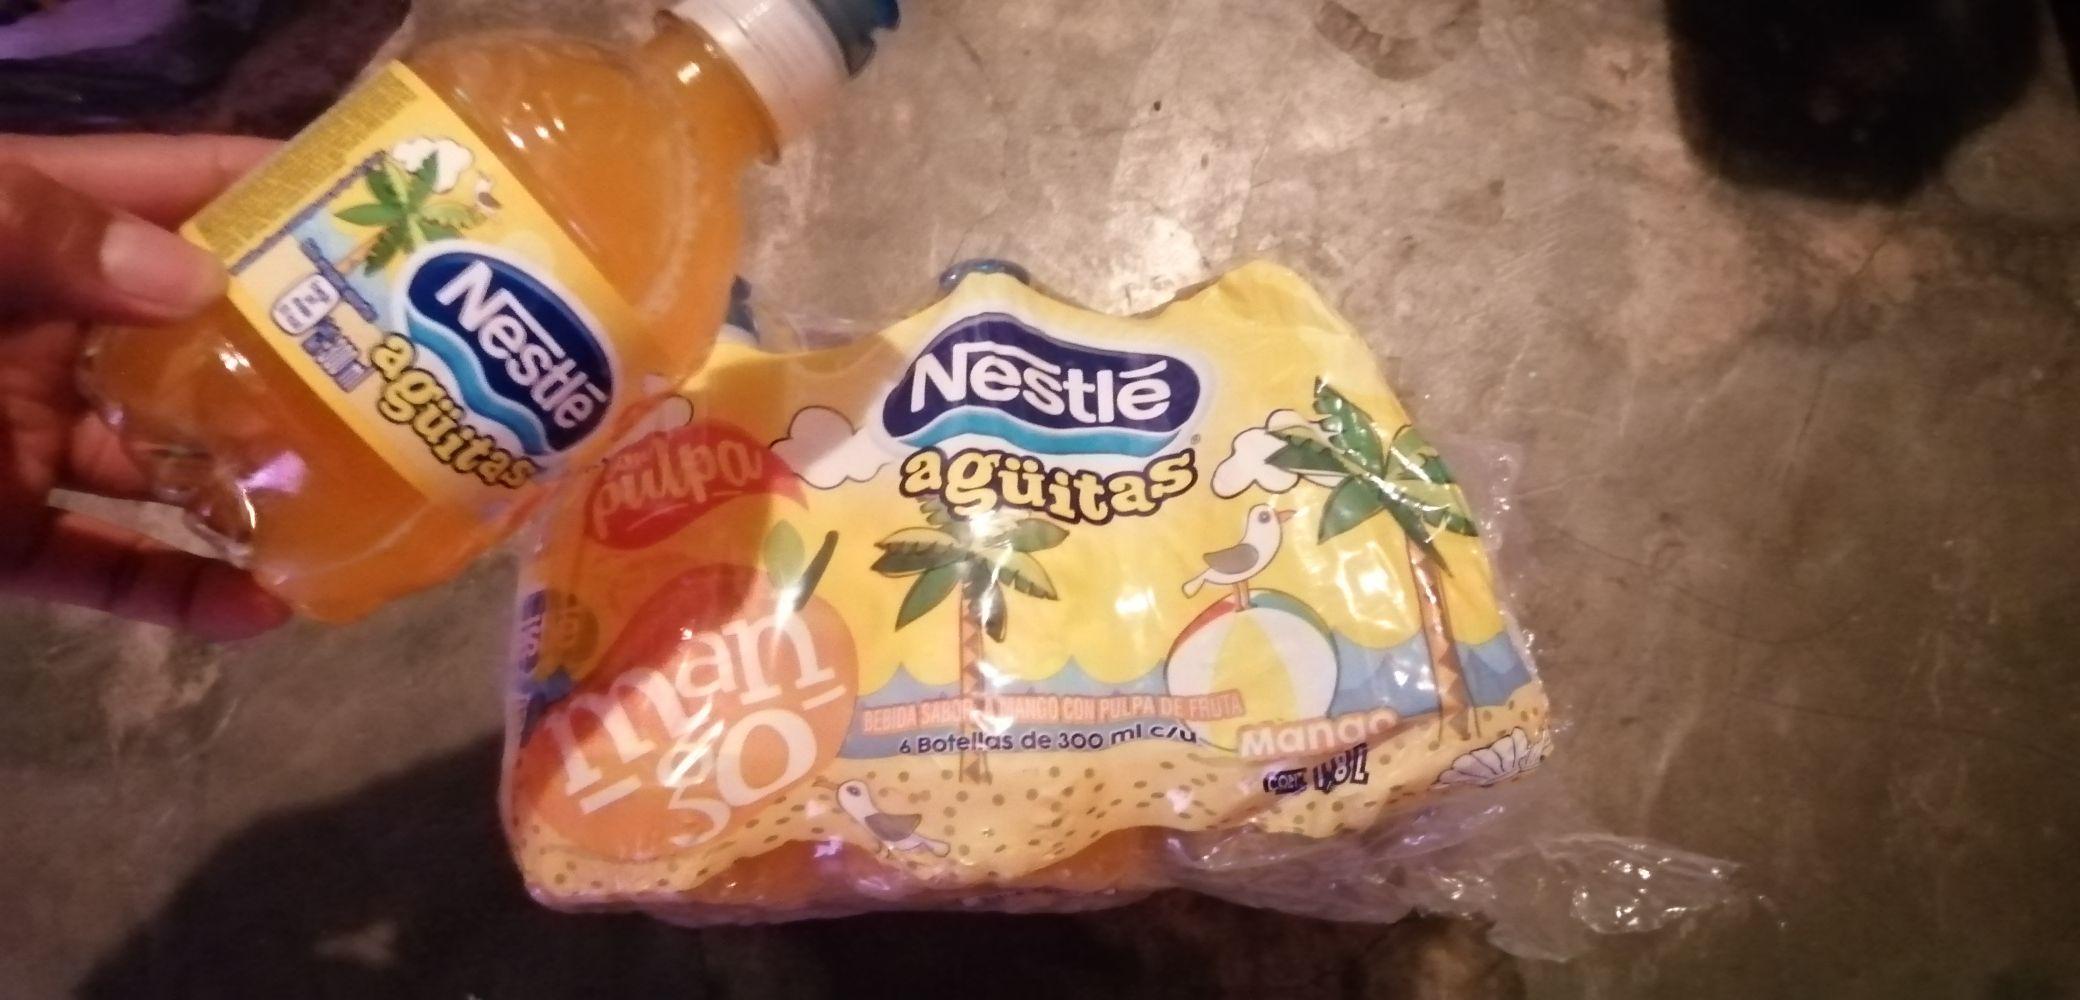 Bodega Aurrera: Agüitas Nestle